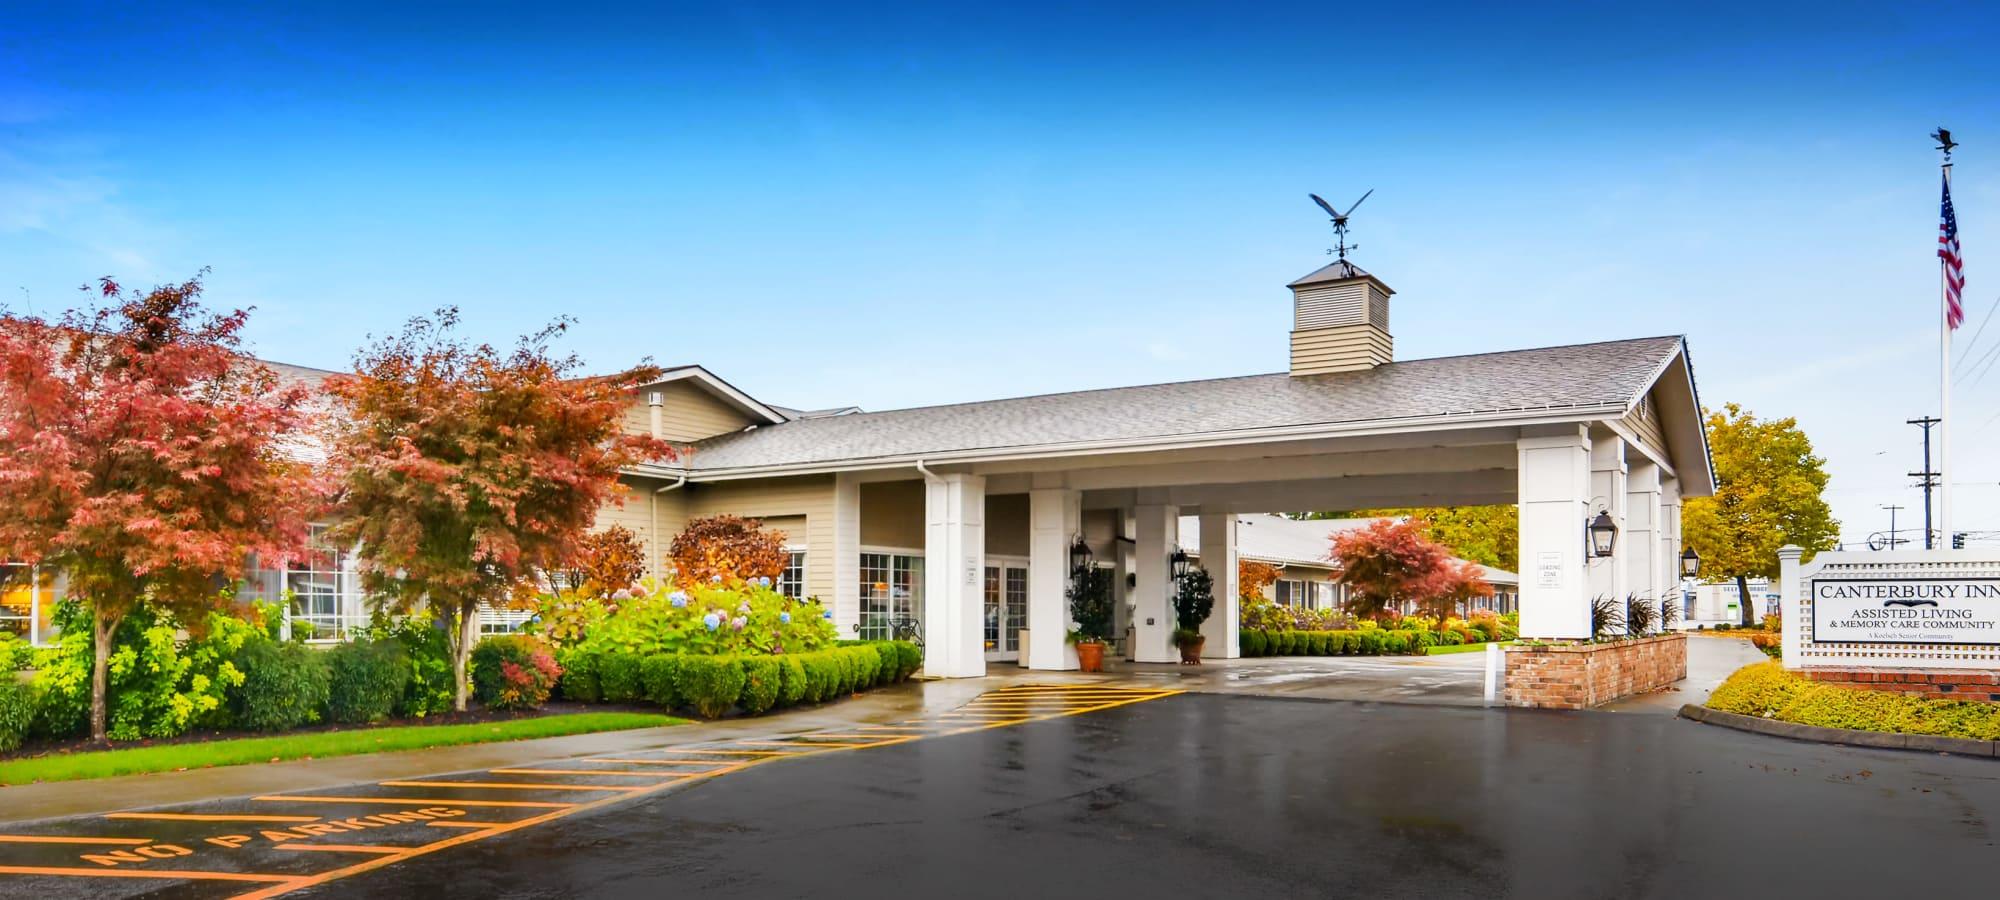 Senior Living in Longview, WA   Canterbury Inn Assisted